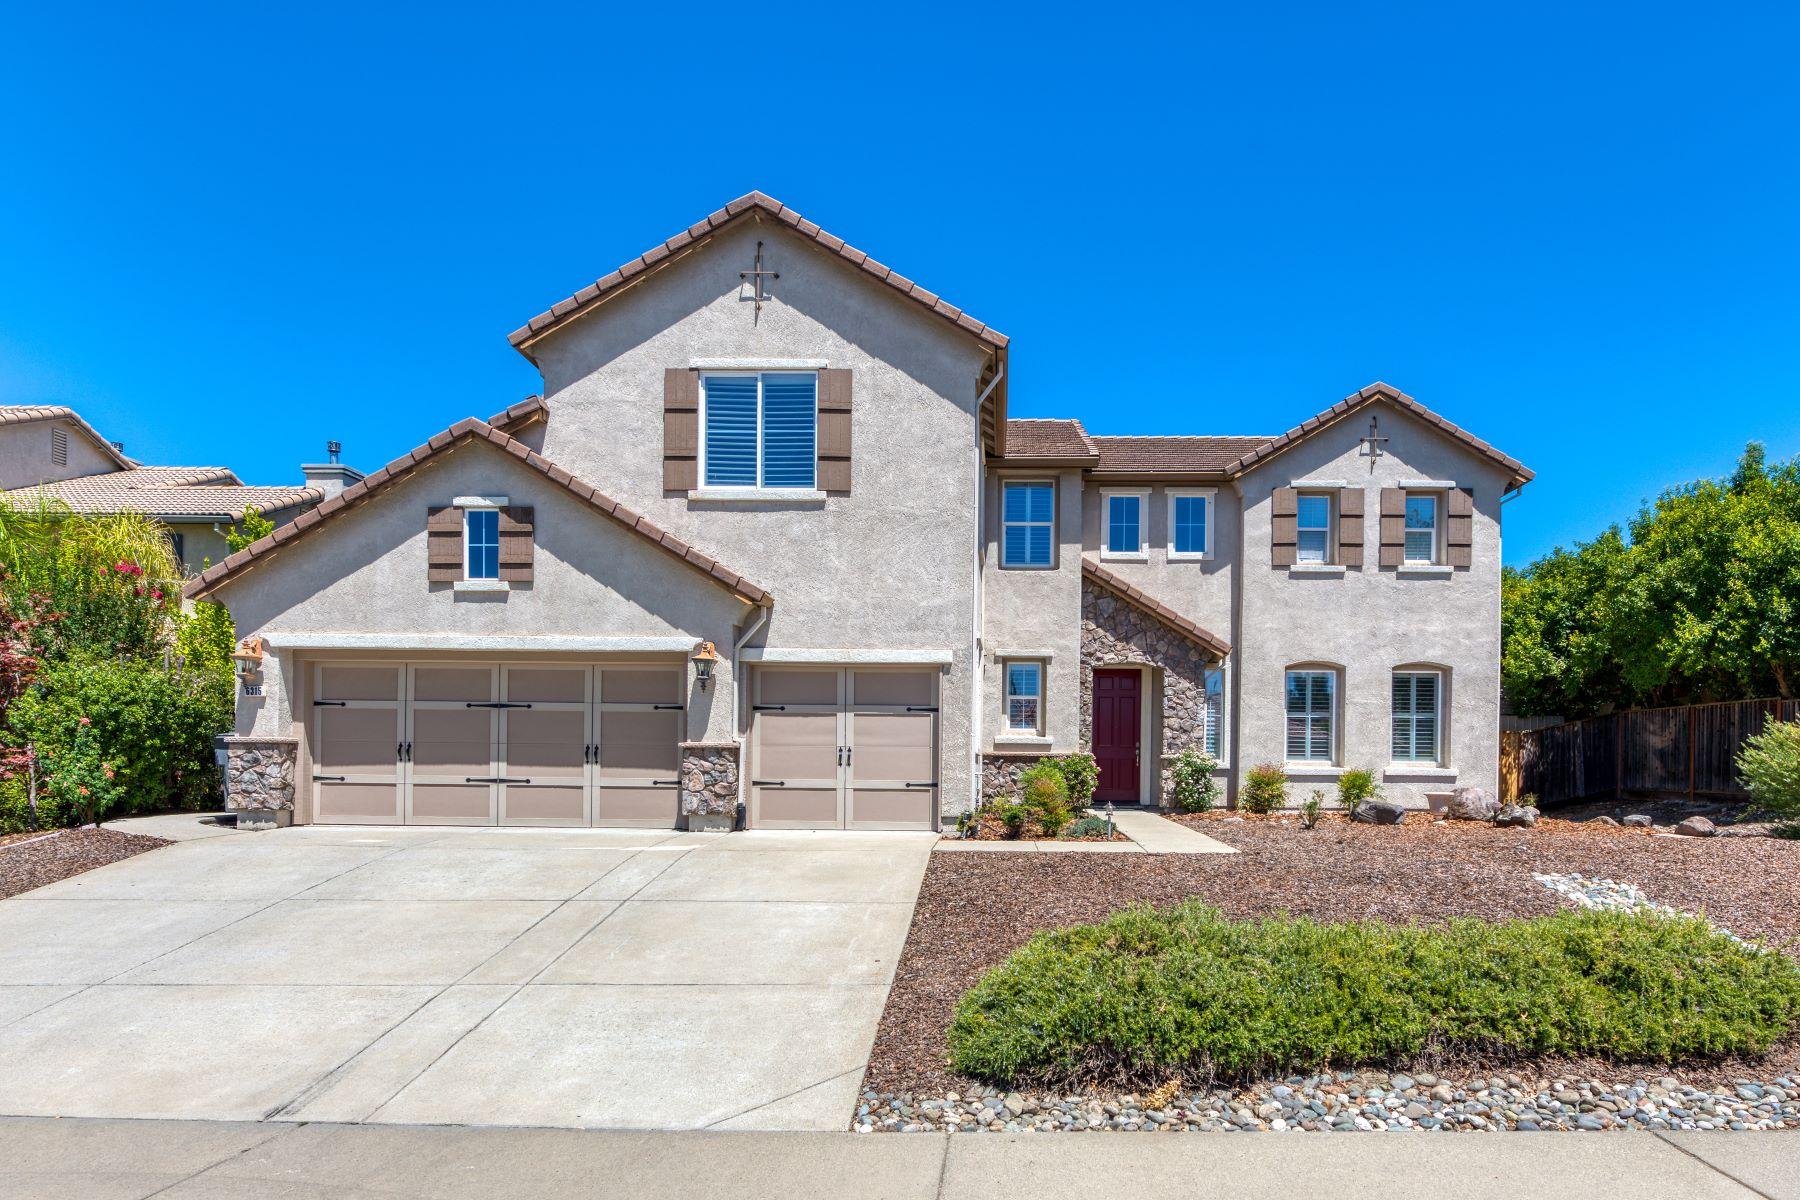 Single Family Homes for Sale at 6315 Galaxy Ln, Rocklin, CA 95677 6315 Galaxy Ln Rocklin, California 95677 United States